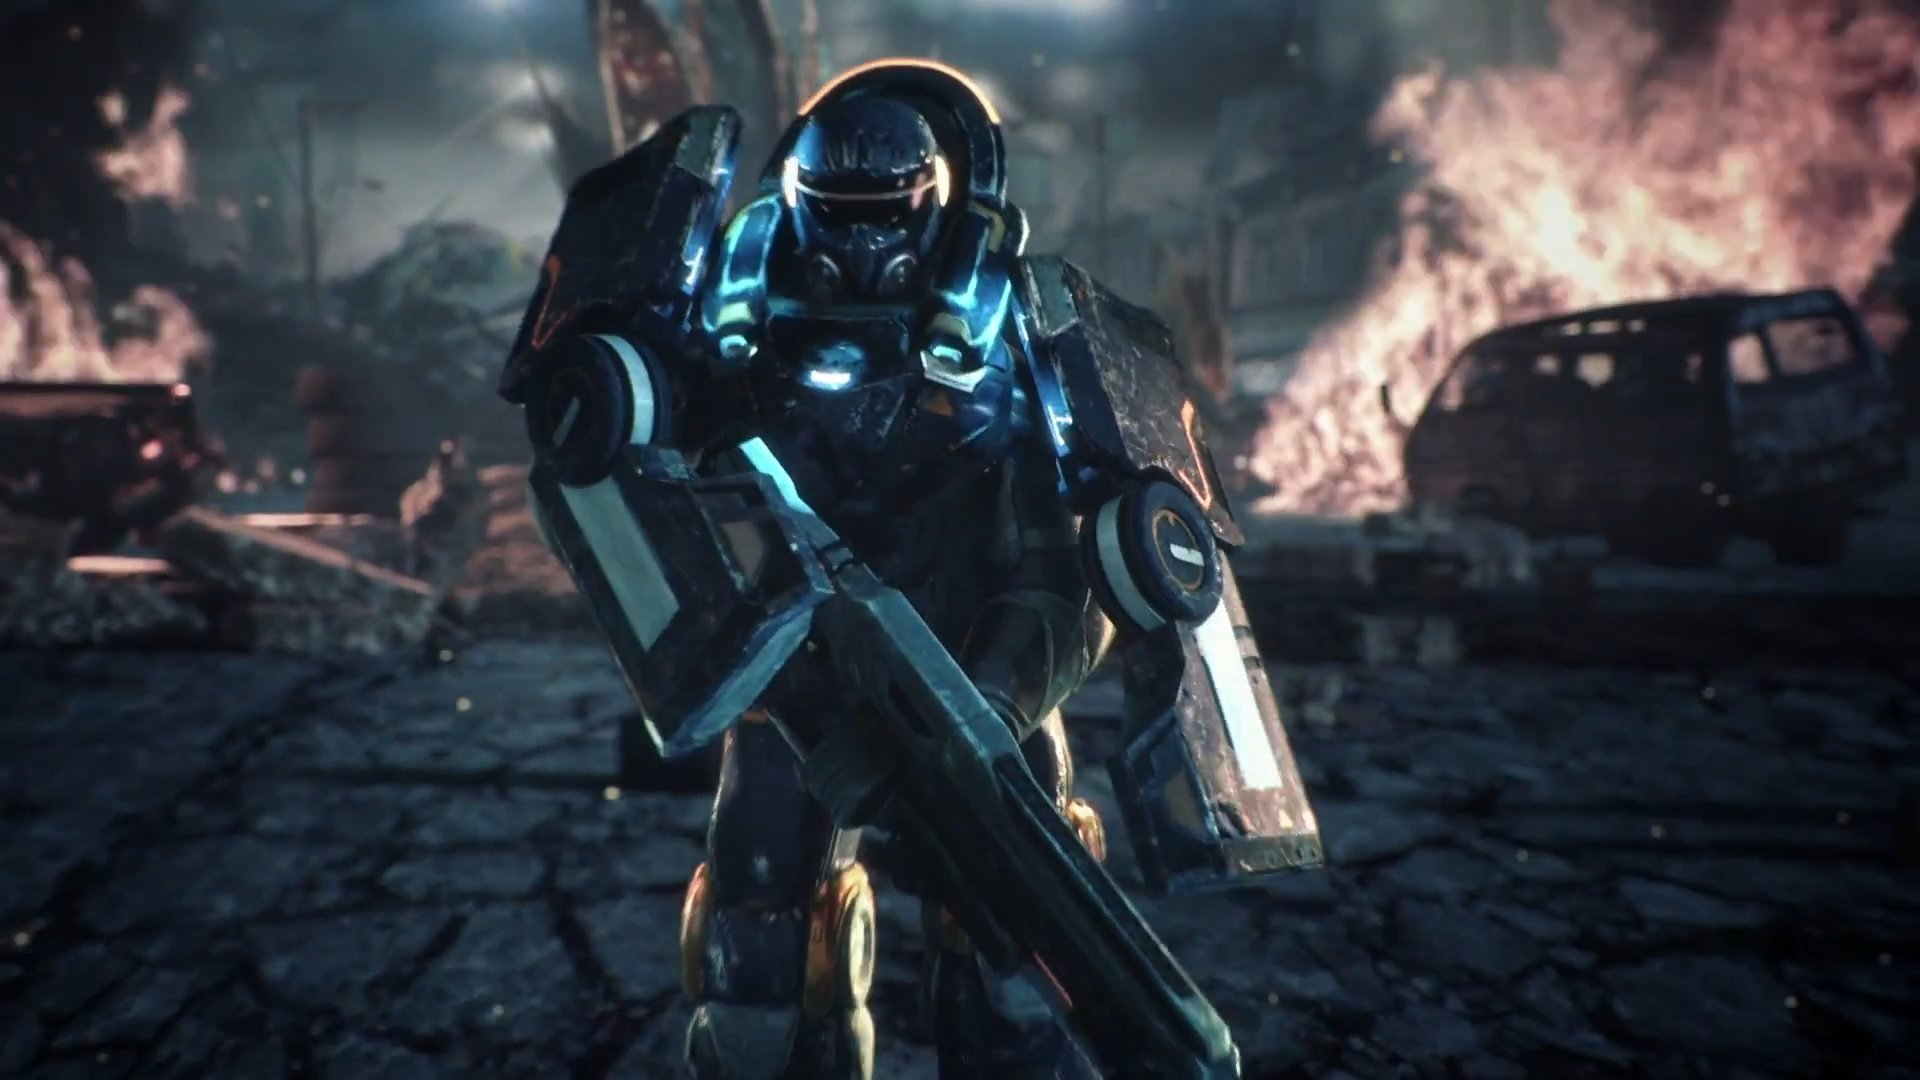 Debut-trailer-screenshots-from-PS4-exclu